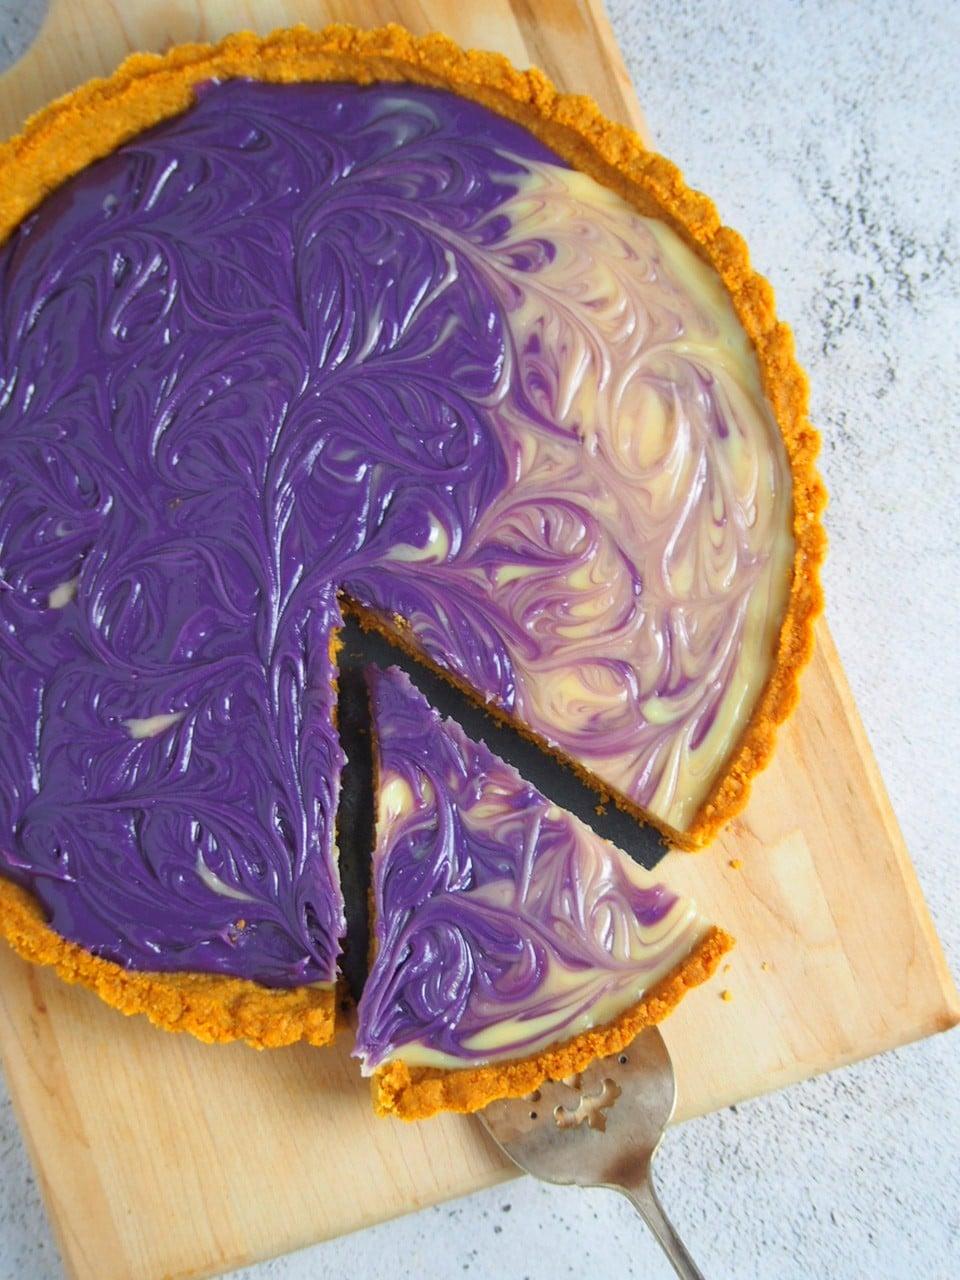 Top angle shot of the ube custard pie.